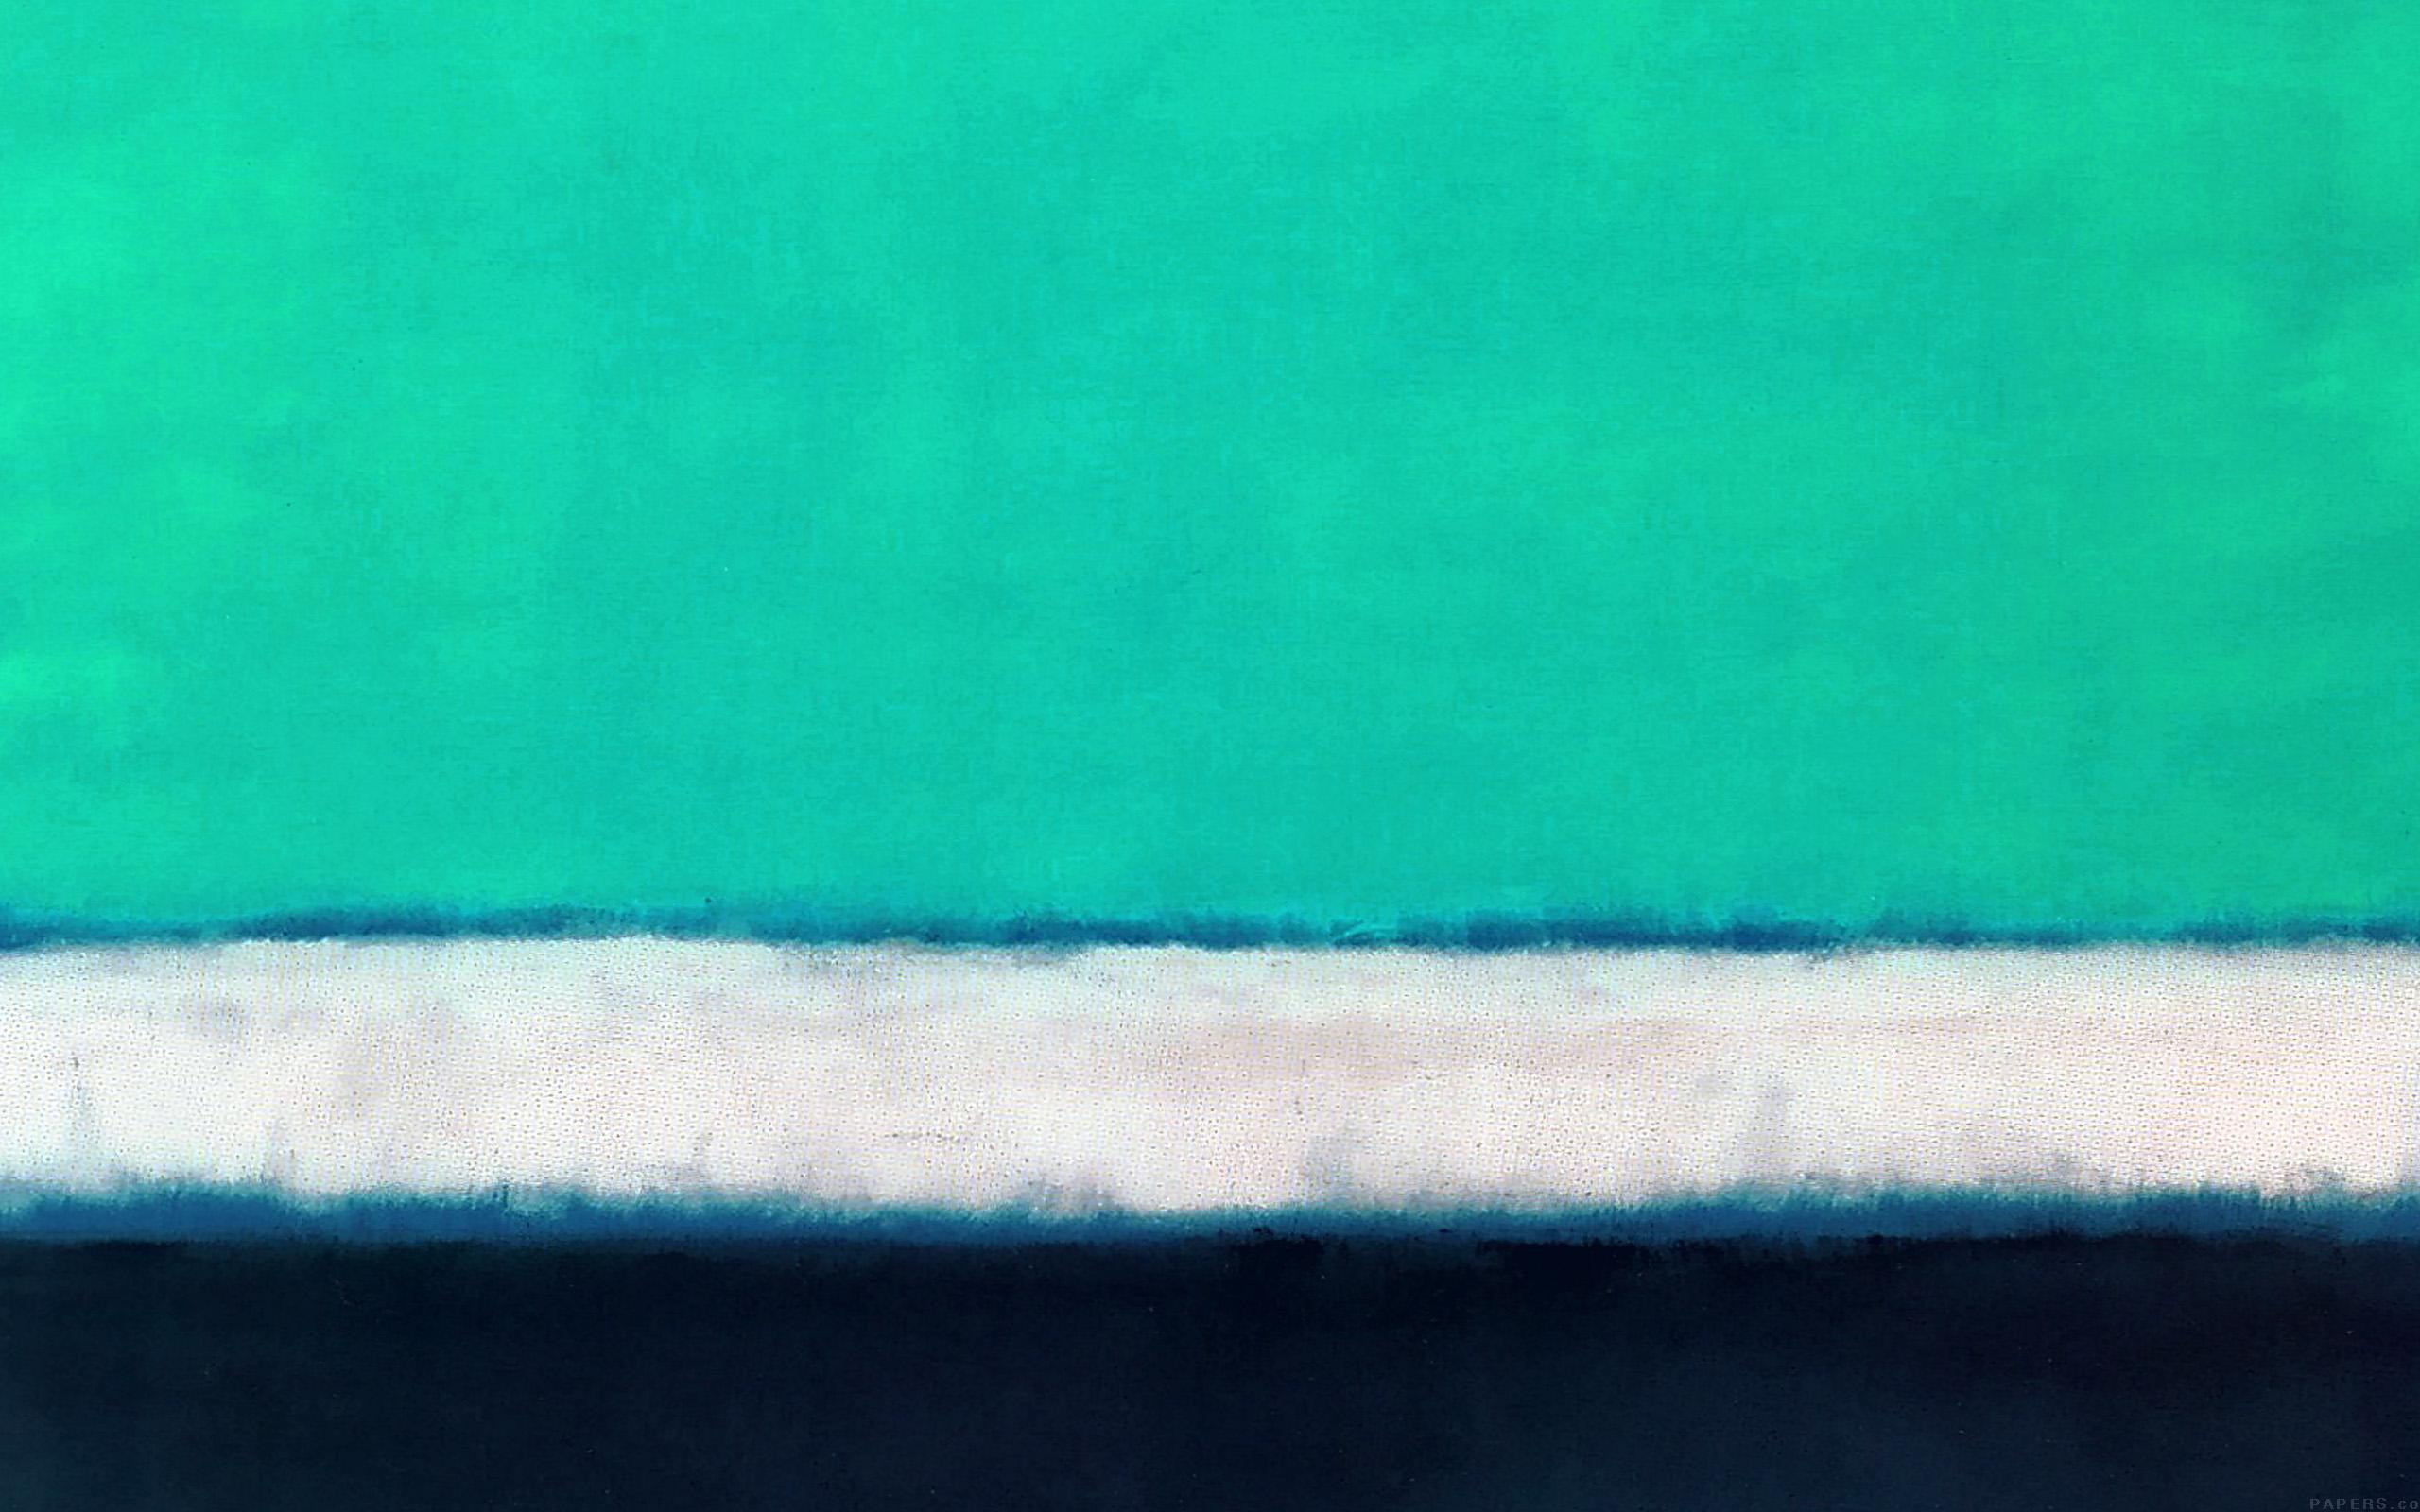 al69-blue-green-rothko-mark-paint-style-art-classic-wallpaper